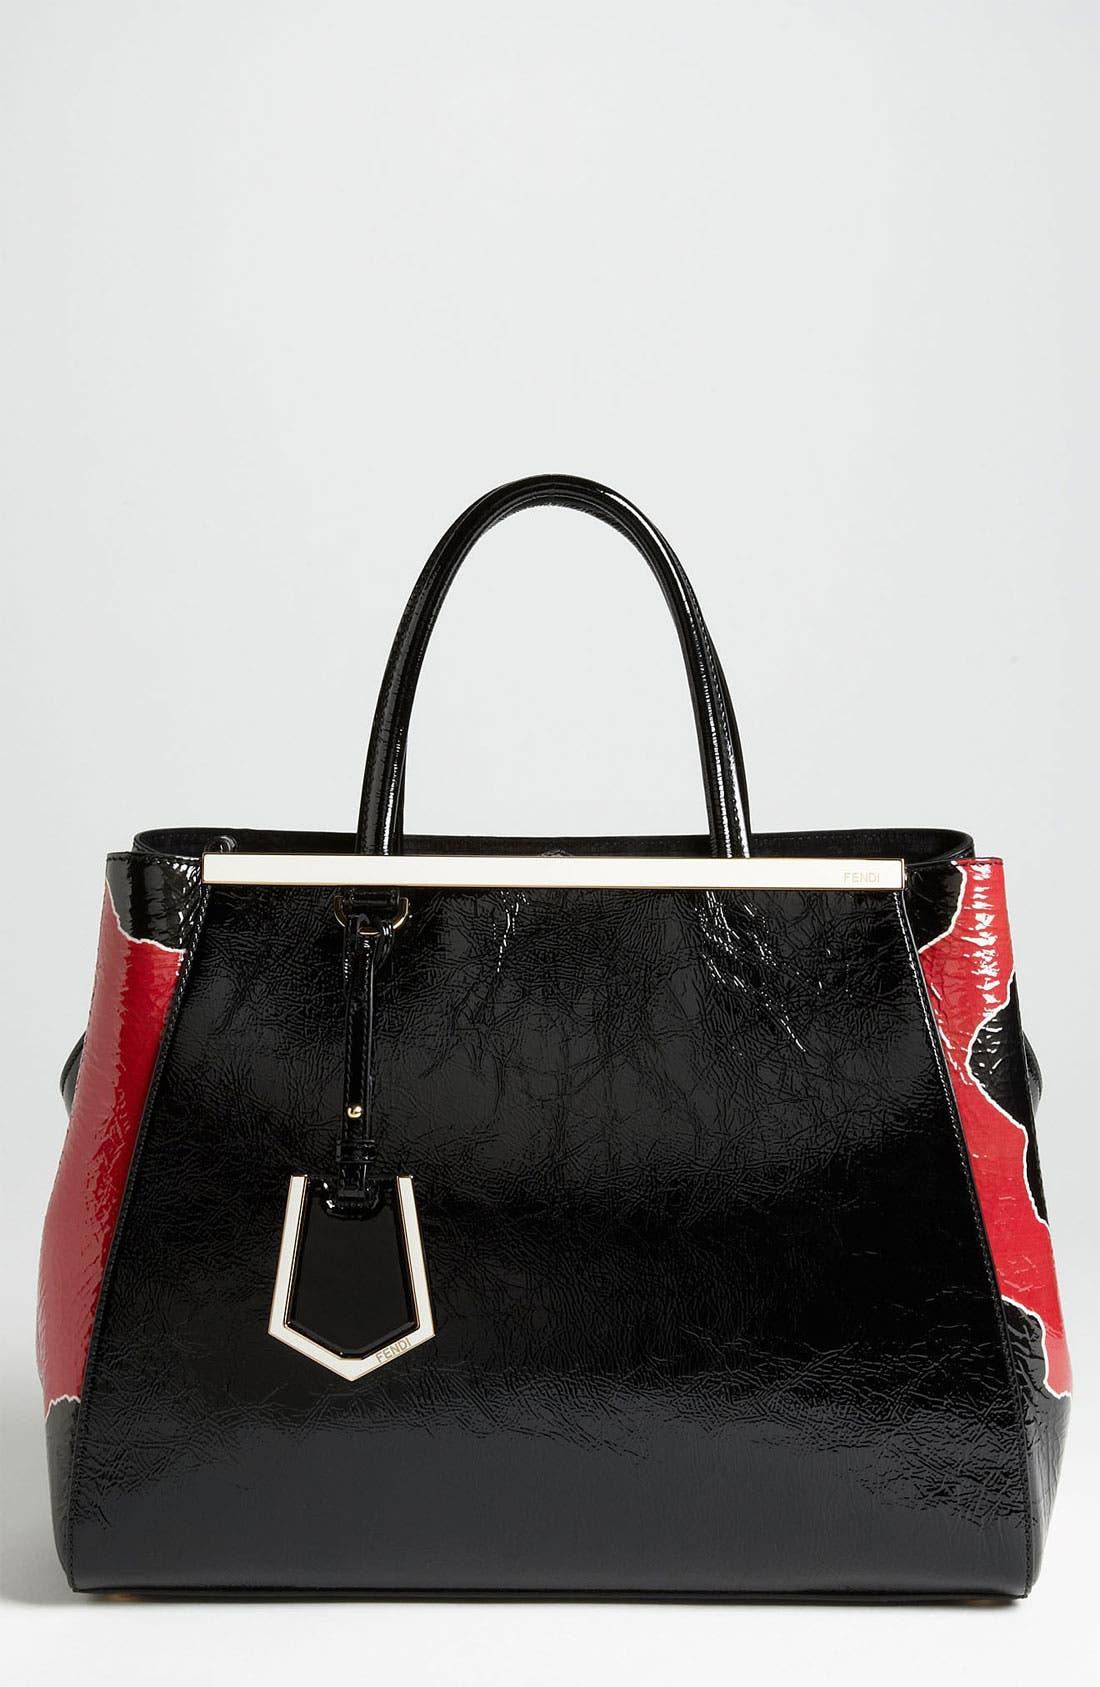 Main Image - Fendi '2Jours - Medium' Patent Leather Shopper